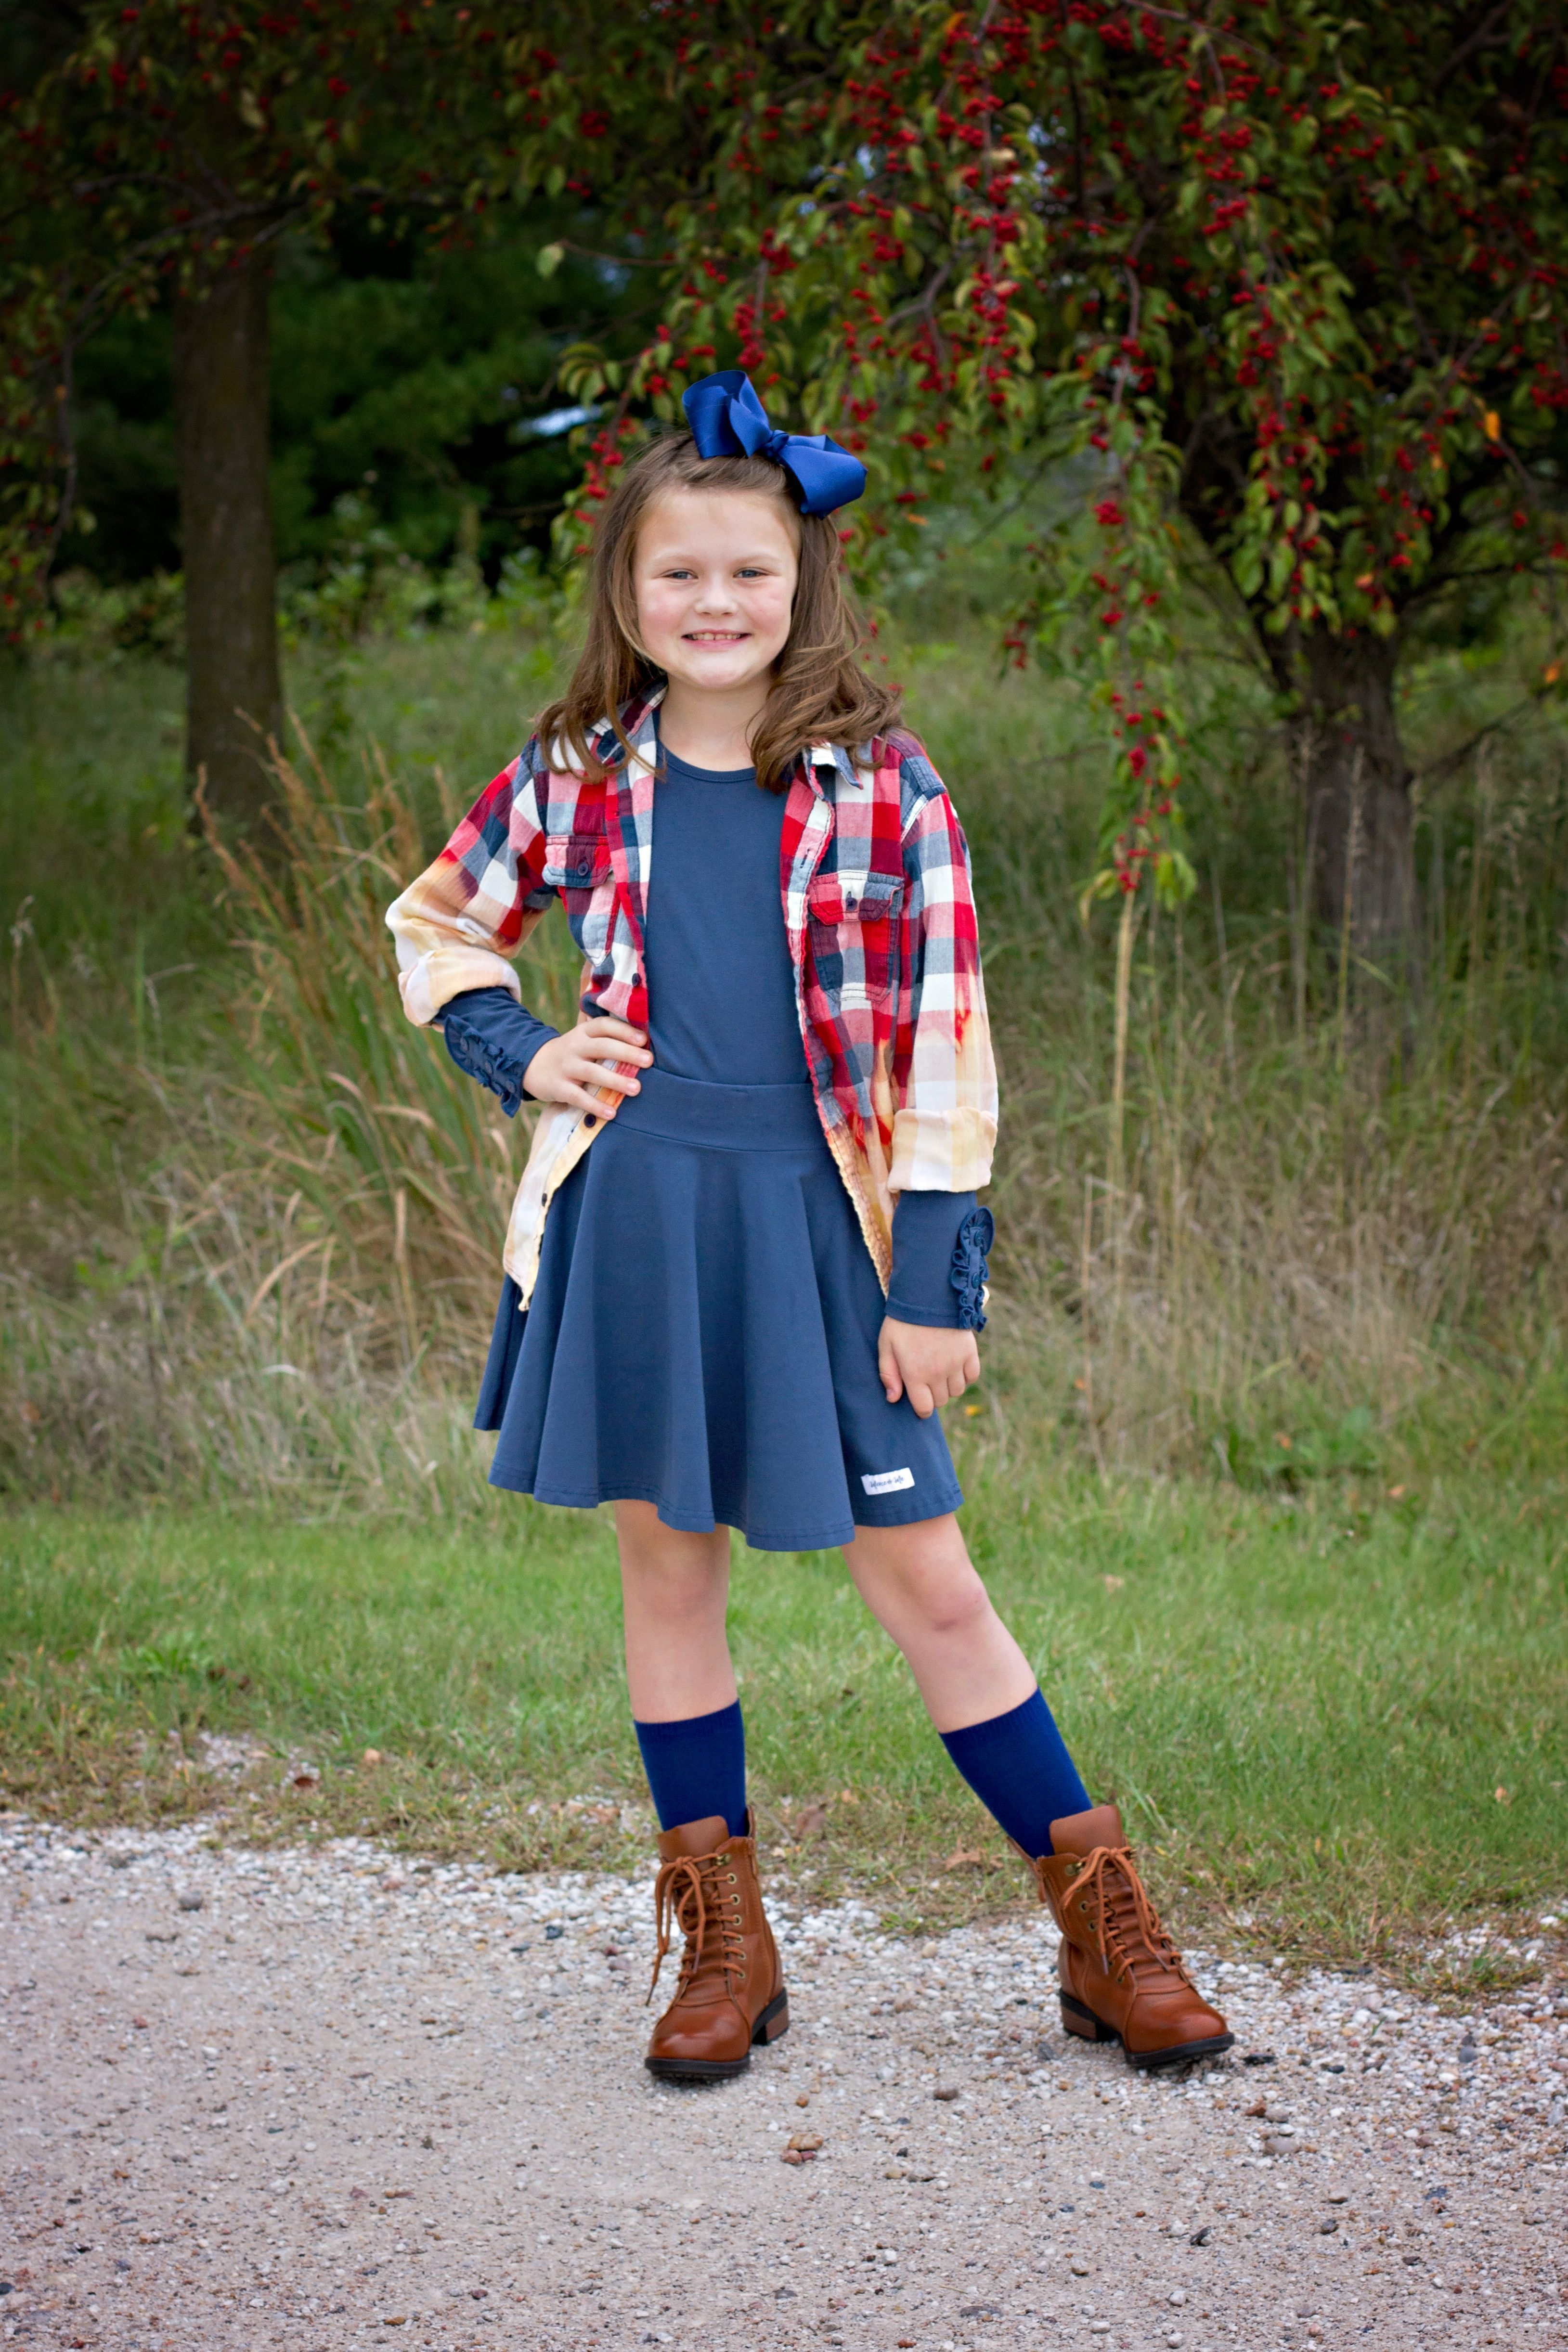 Plaid + Twirl Skirt #twirlskirt Loving this pop of color layered over #merceandme Bettie Buttons top and matching navy twirl skirt.  So good for fall! #tweenfashion #twirlskirt #plaid #distressedplaid #fallfaahion #navy #twirlskirt Plaid + Twirl Skirt #twirlskirt Loving this pop of color layered over #merceandme Bettie Buttons top and matching navy twirl skirt.  So good for fall! #tweenfashion #twirlskirt #plaid #distressedplaid #fallfaahion #navy #twirlskirt Plaid + Twirl Skirt #twirlskirt Lovi #twirlskirt